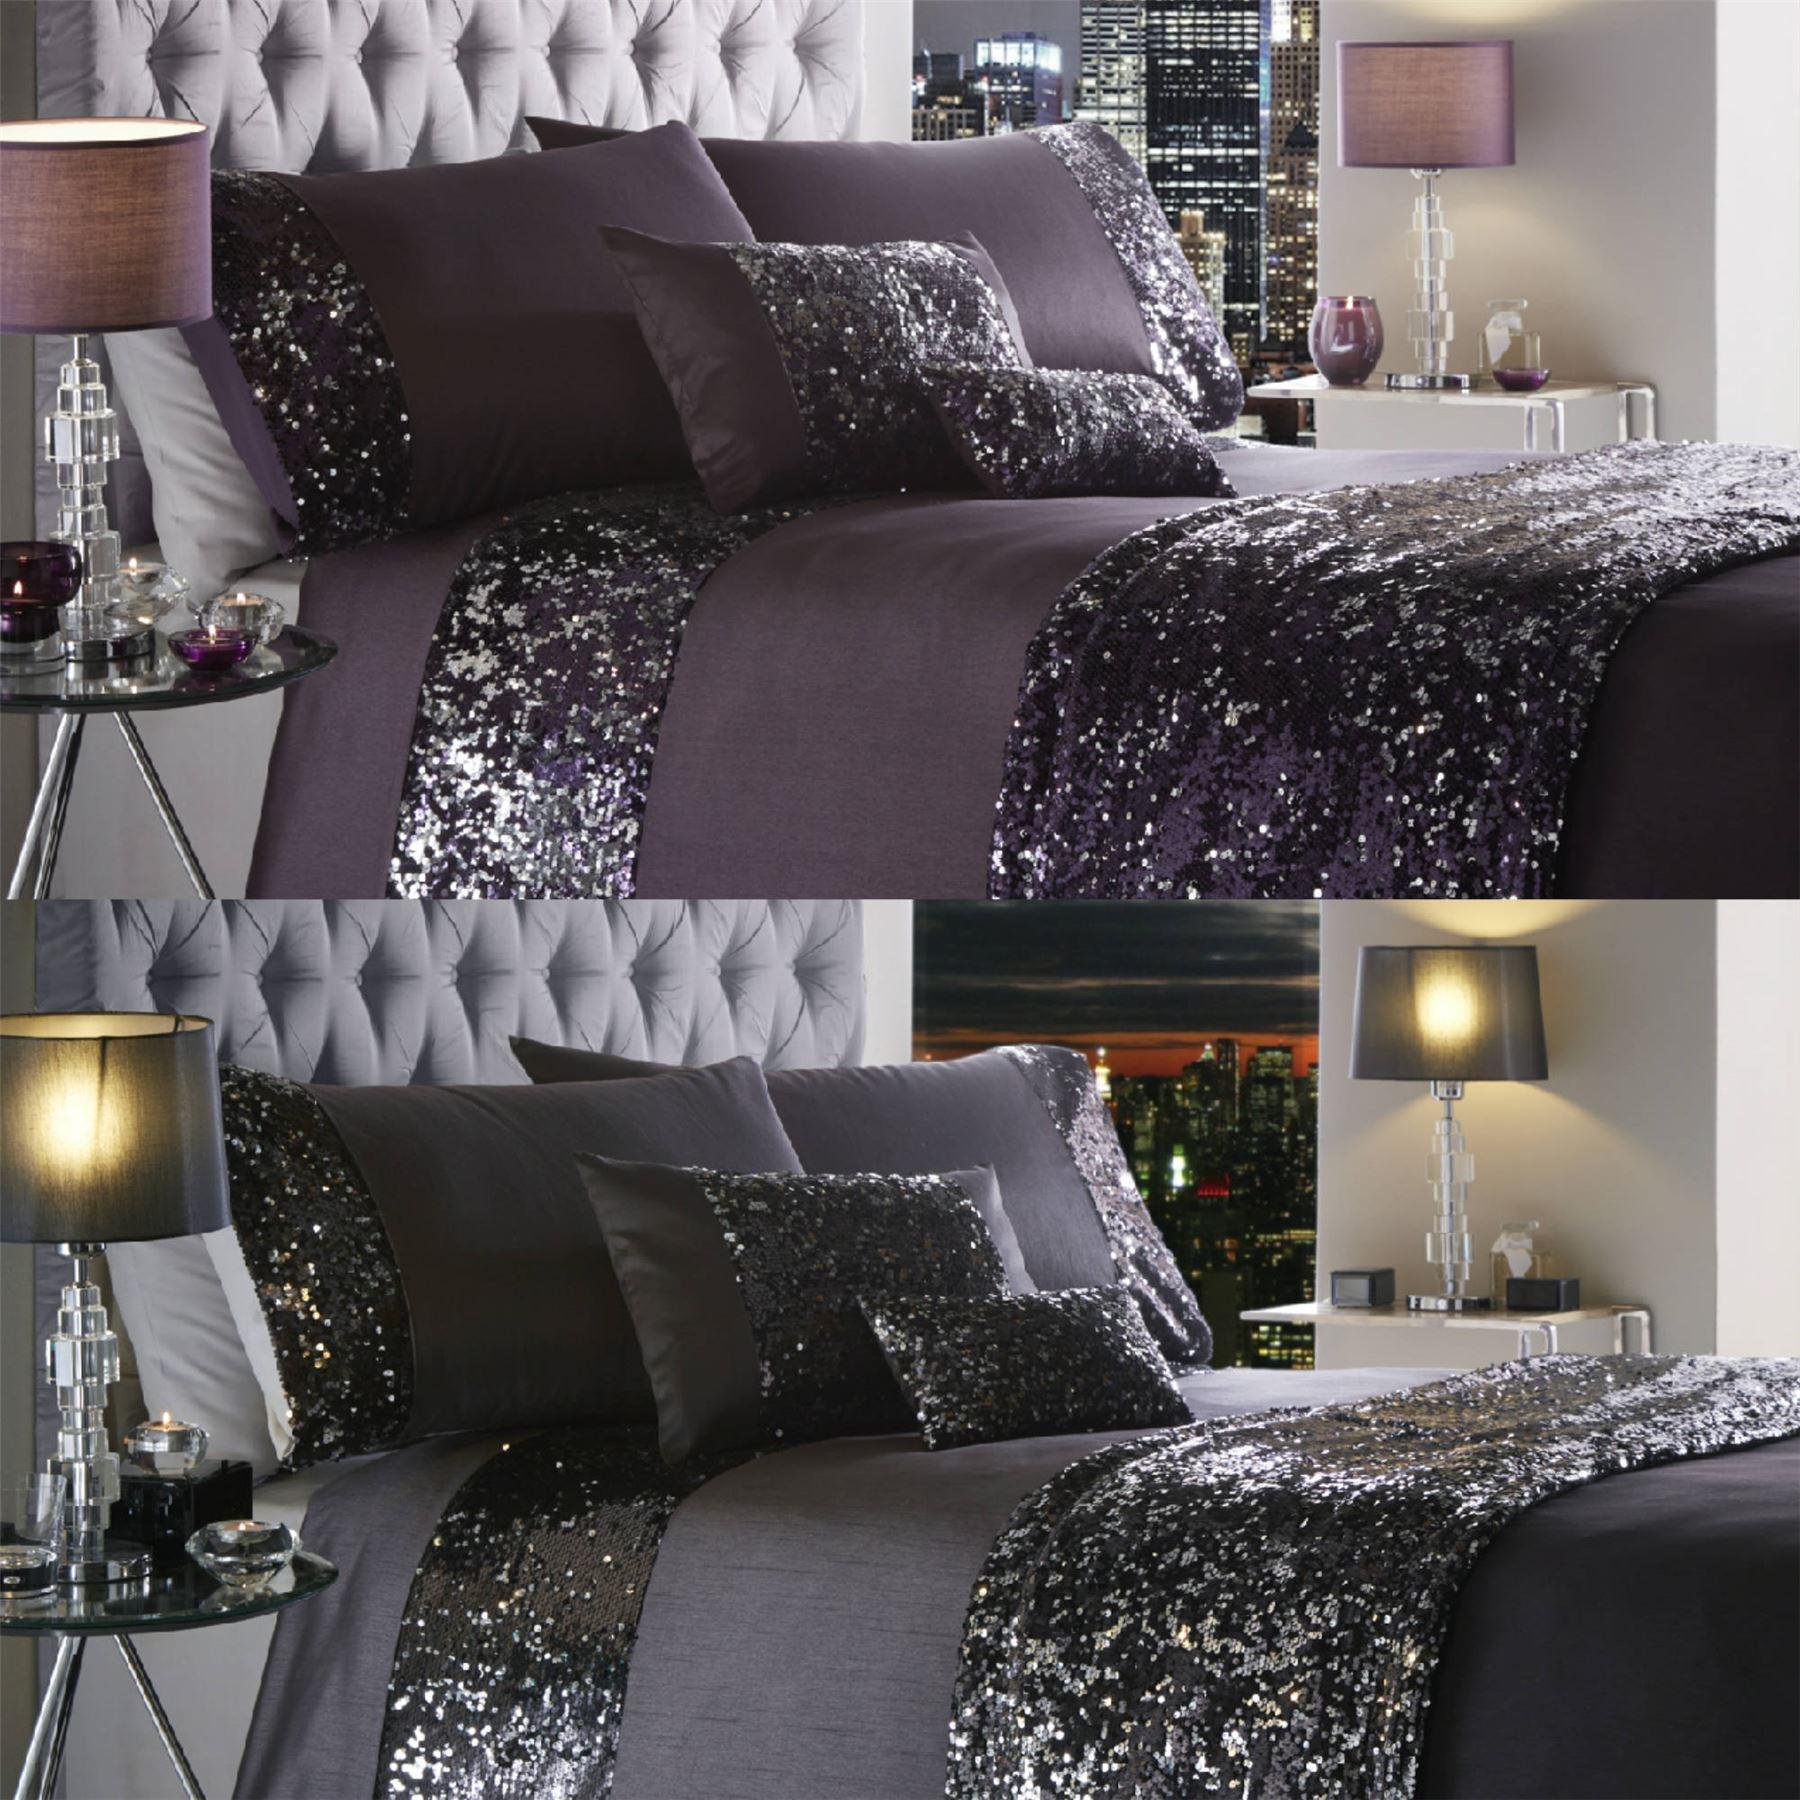 luxury sequin duvet quilt cover bedding set dazzle ebay. Black Bedroom Furniture Sets. Home Design Ideas